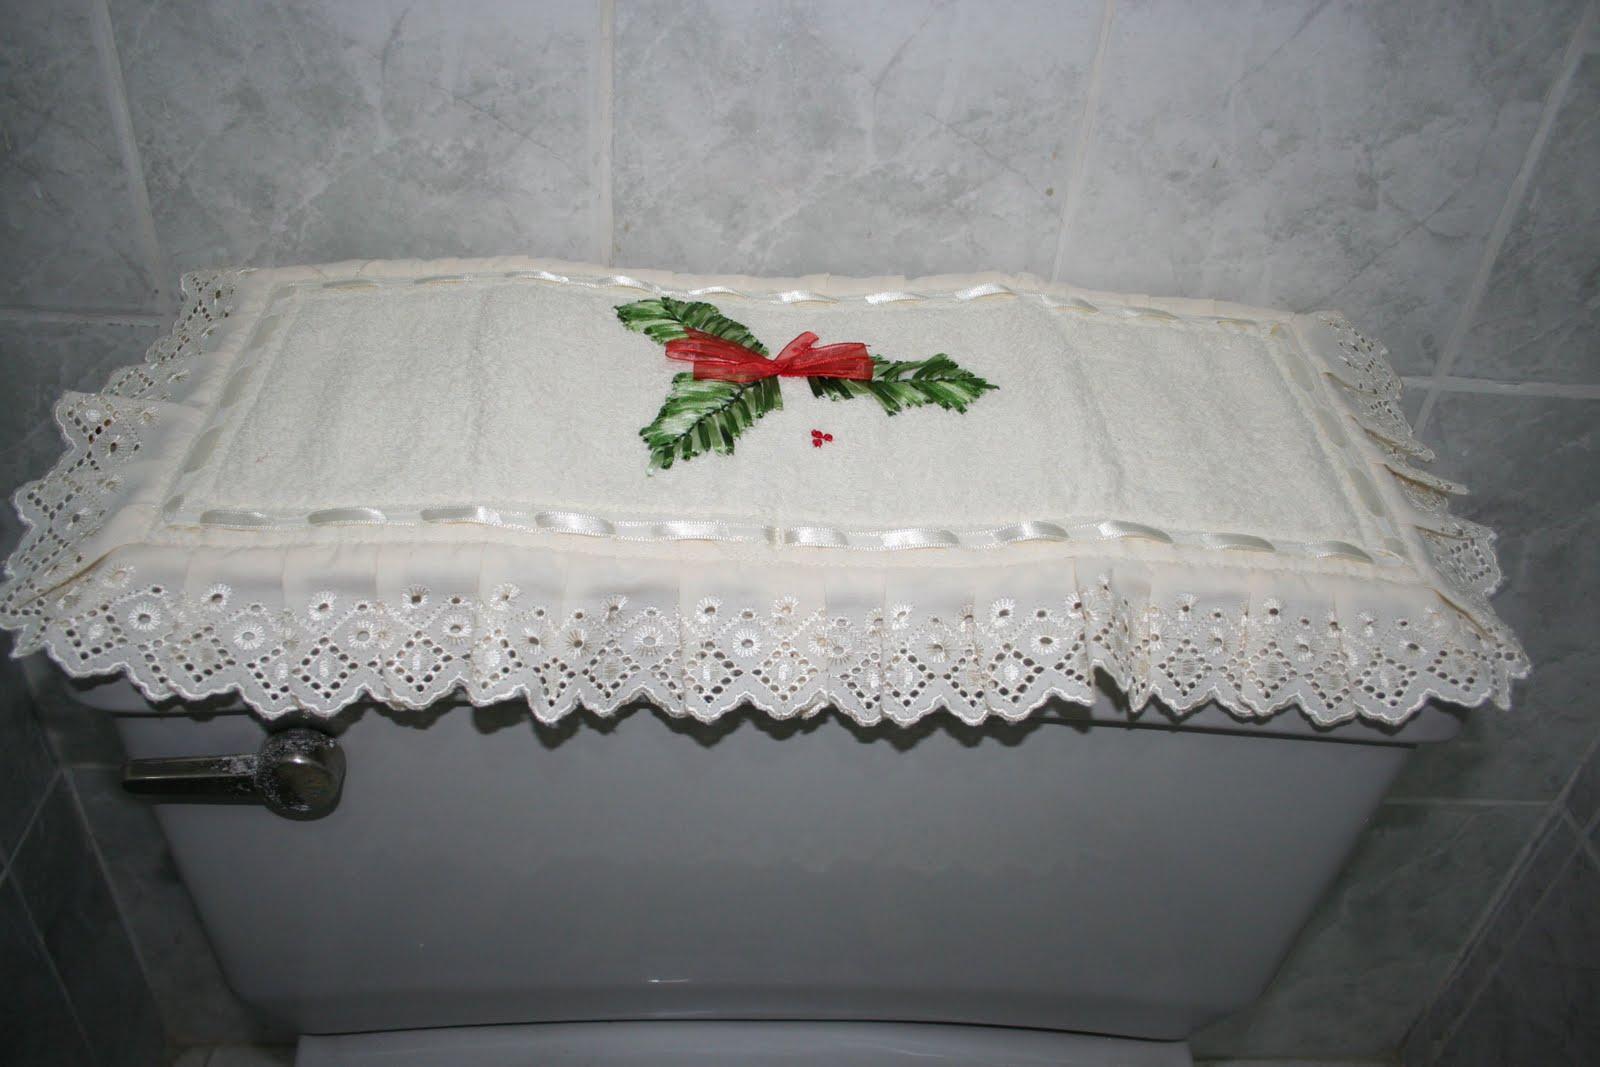 Juego De Baño Navideno Con Cinta:Vio Ganoza: Juego de Baño Navideño bordado con cintas